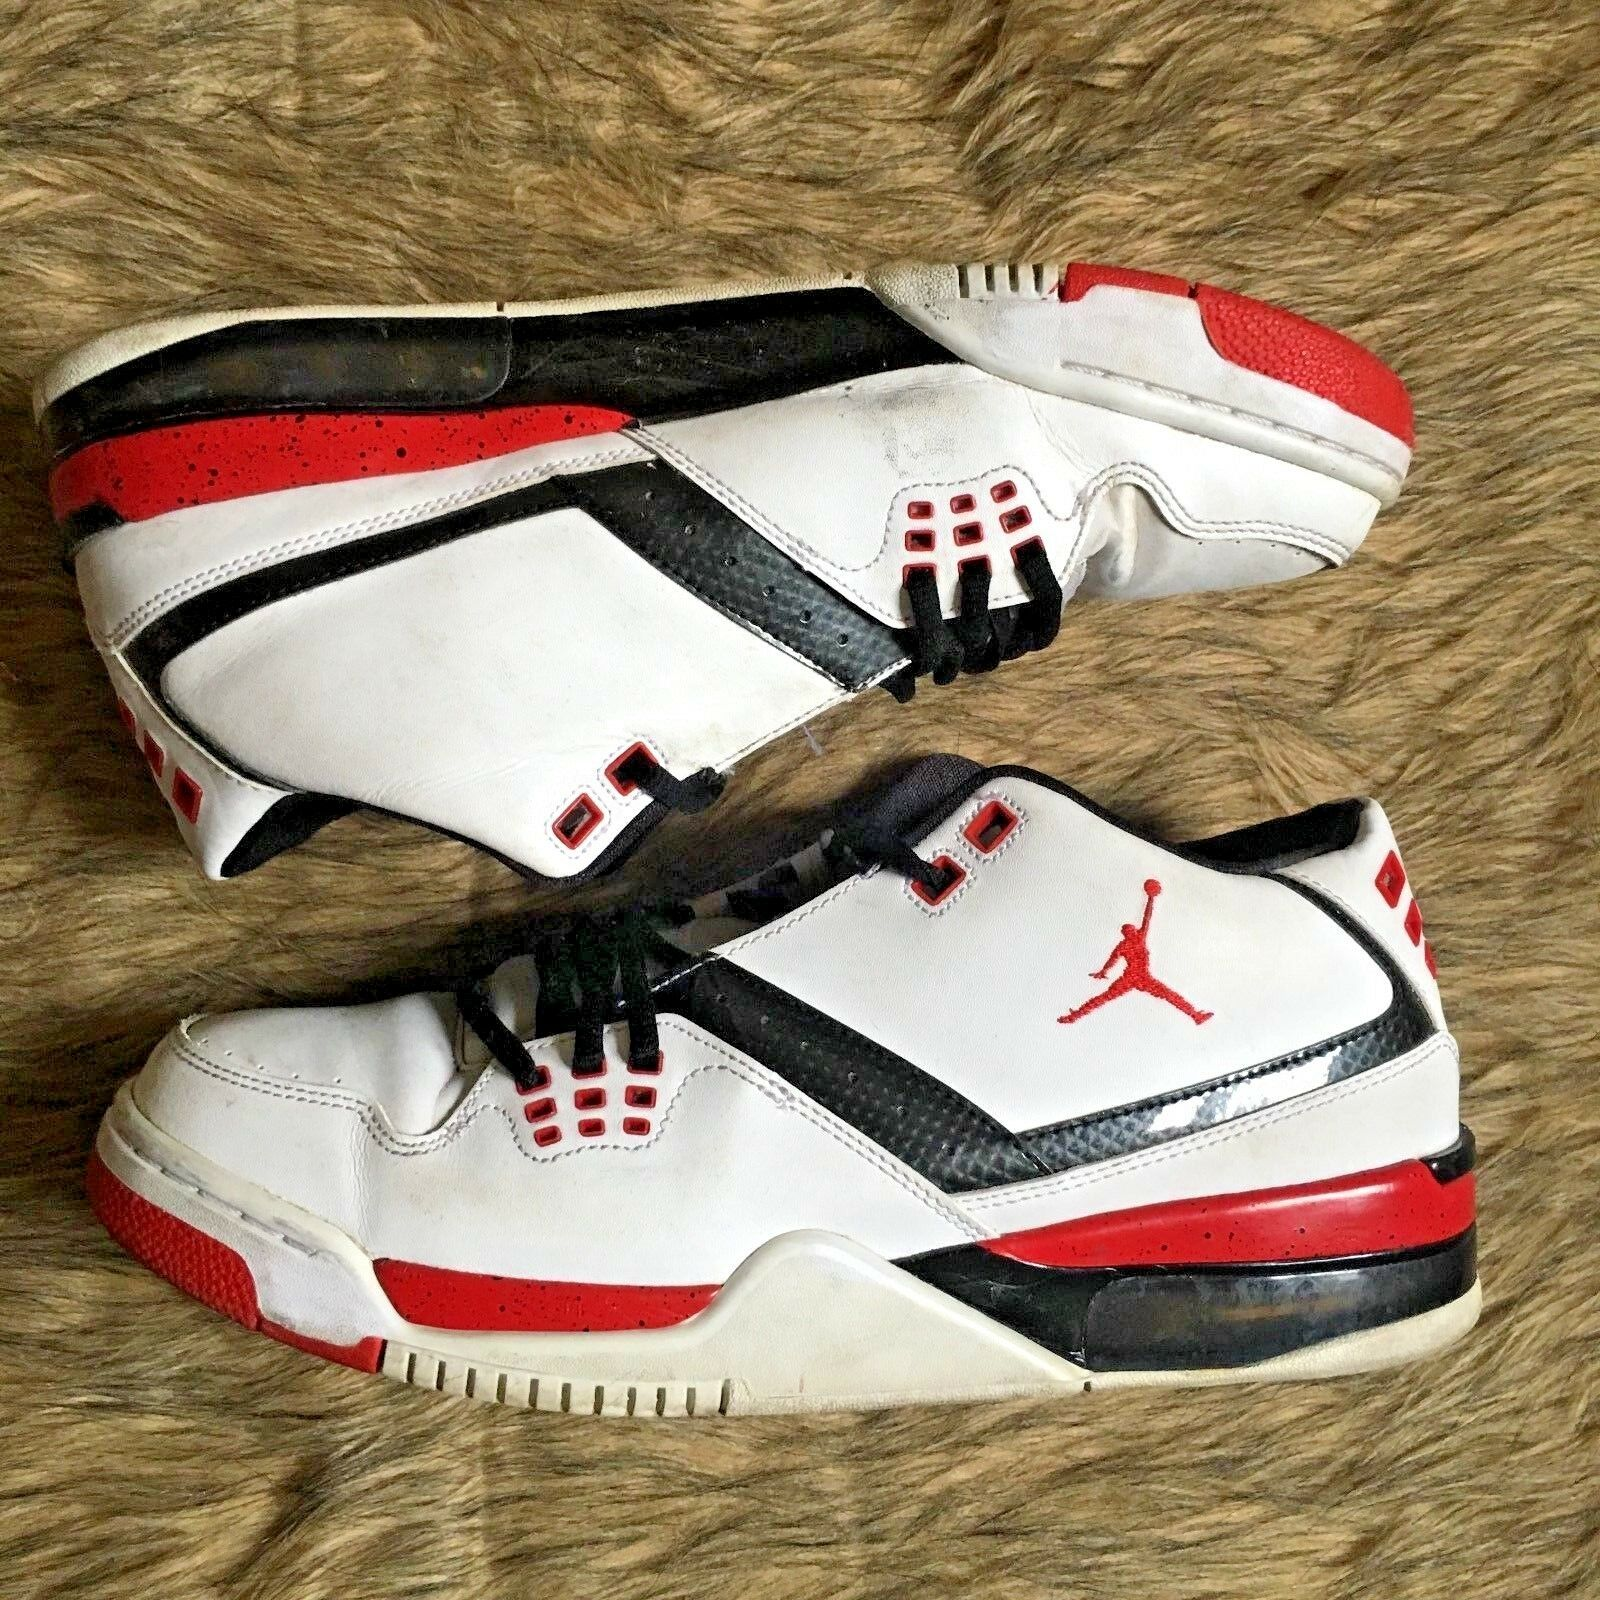 Men's Nike Air Jordan Flight 23 White/Red Basketball Shoes 317820-116 Size 11.5